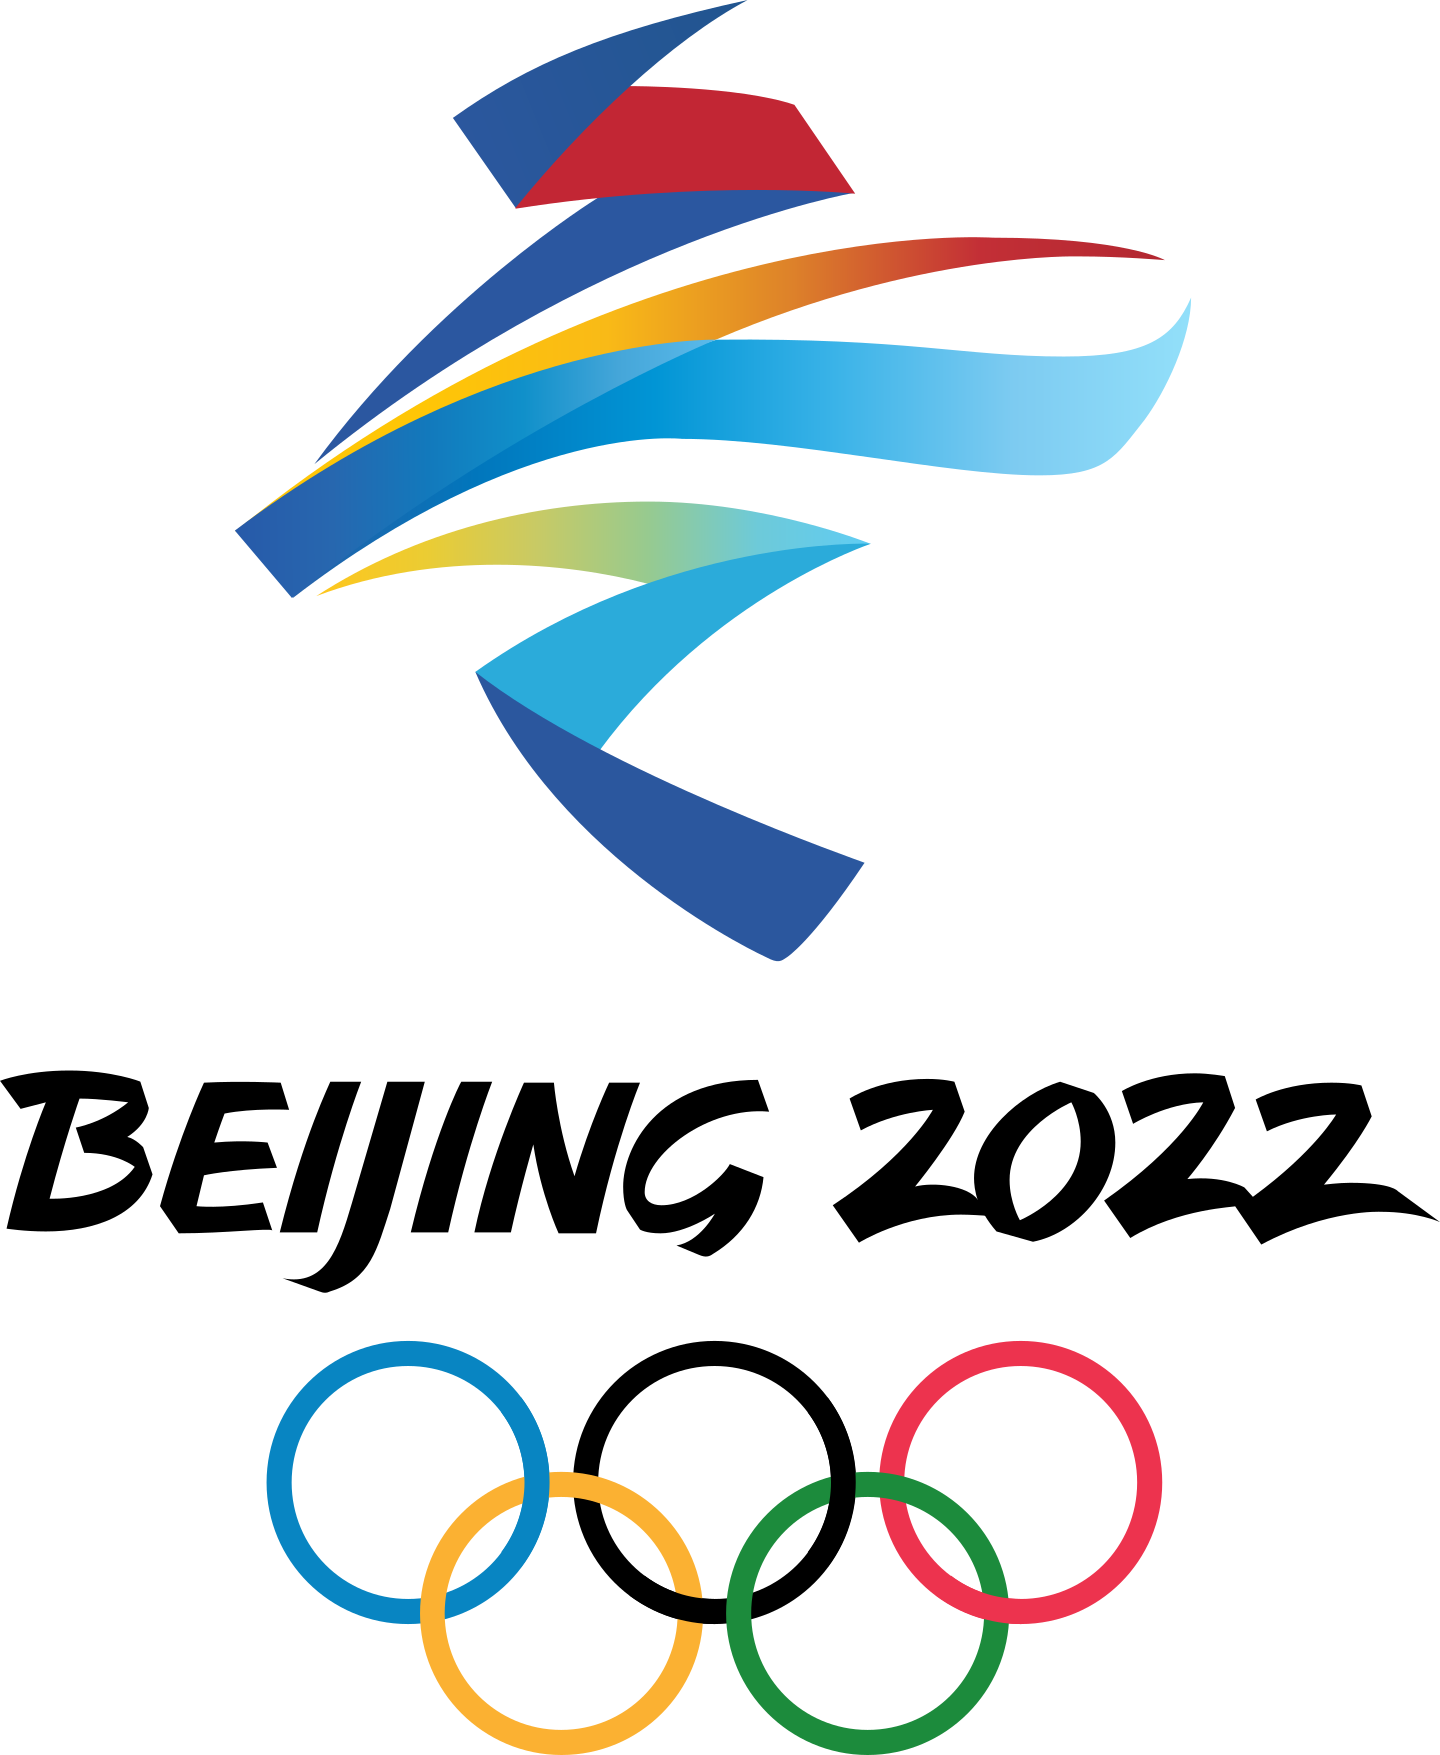 beijing 2022 logo 2 - Beijing 2022 Logo